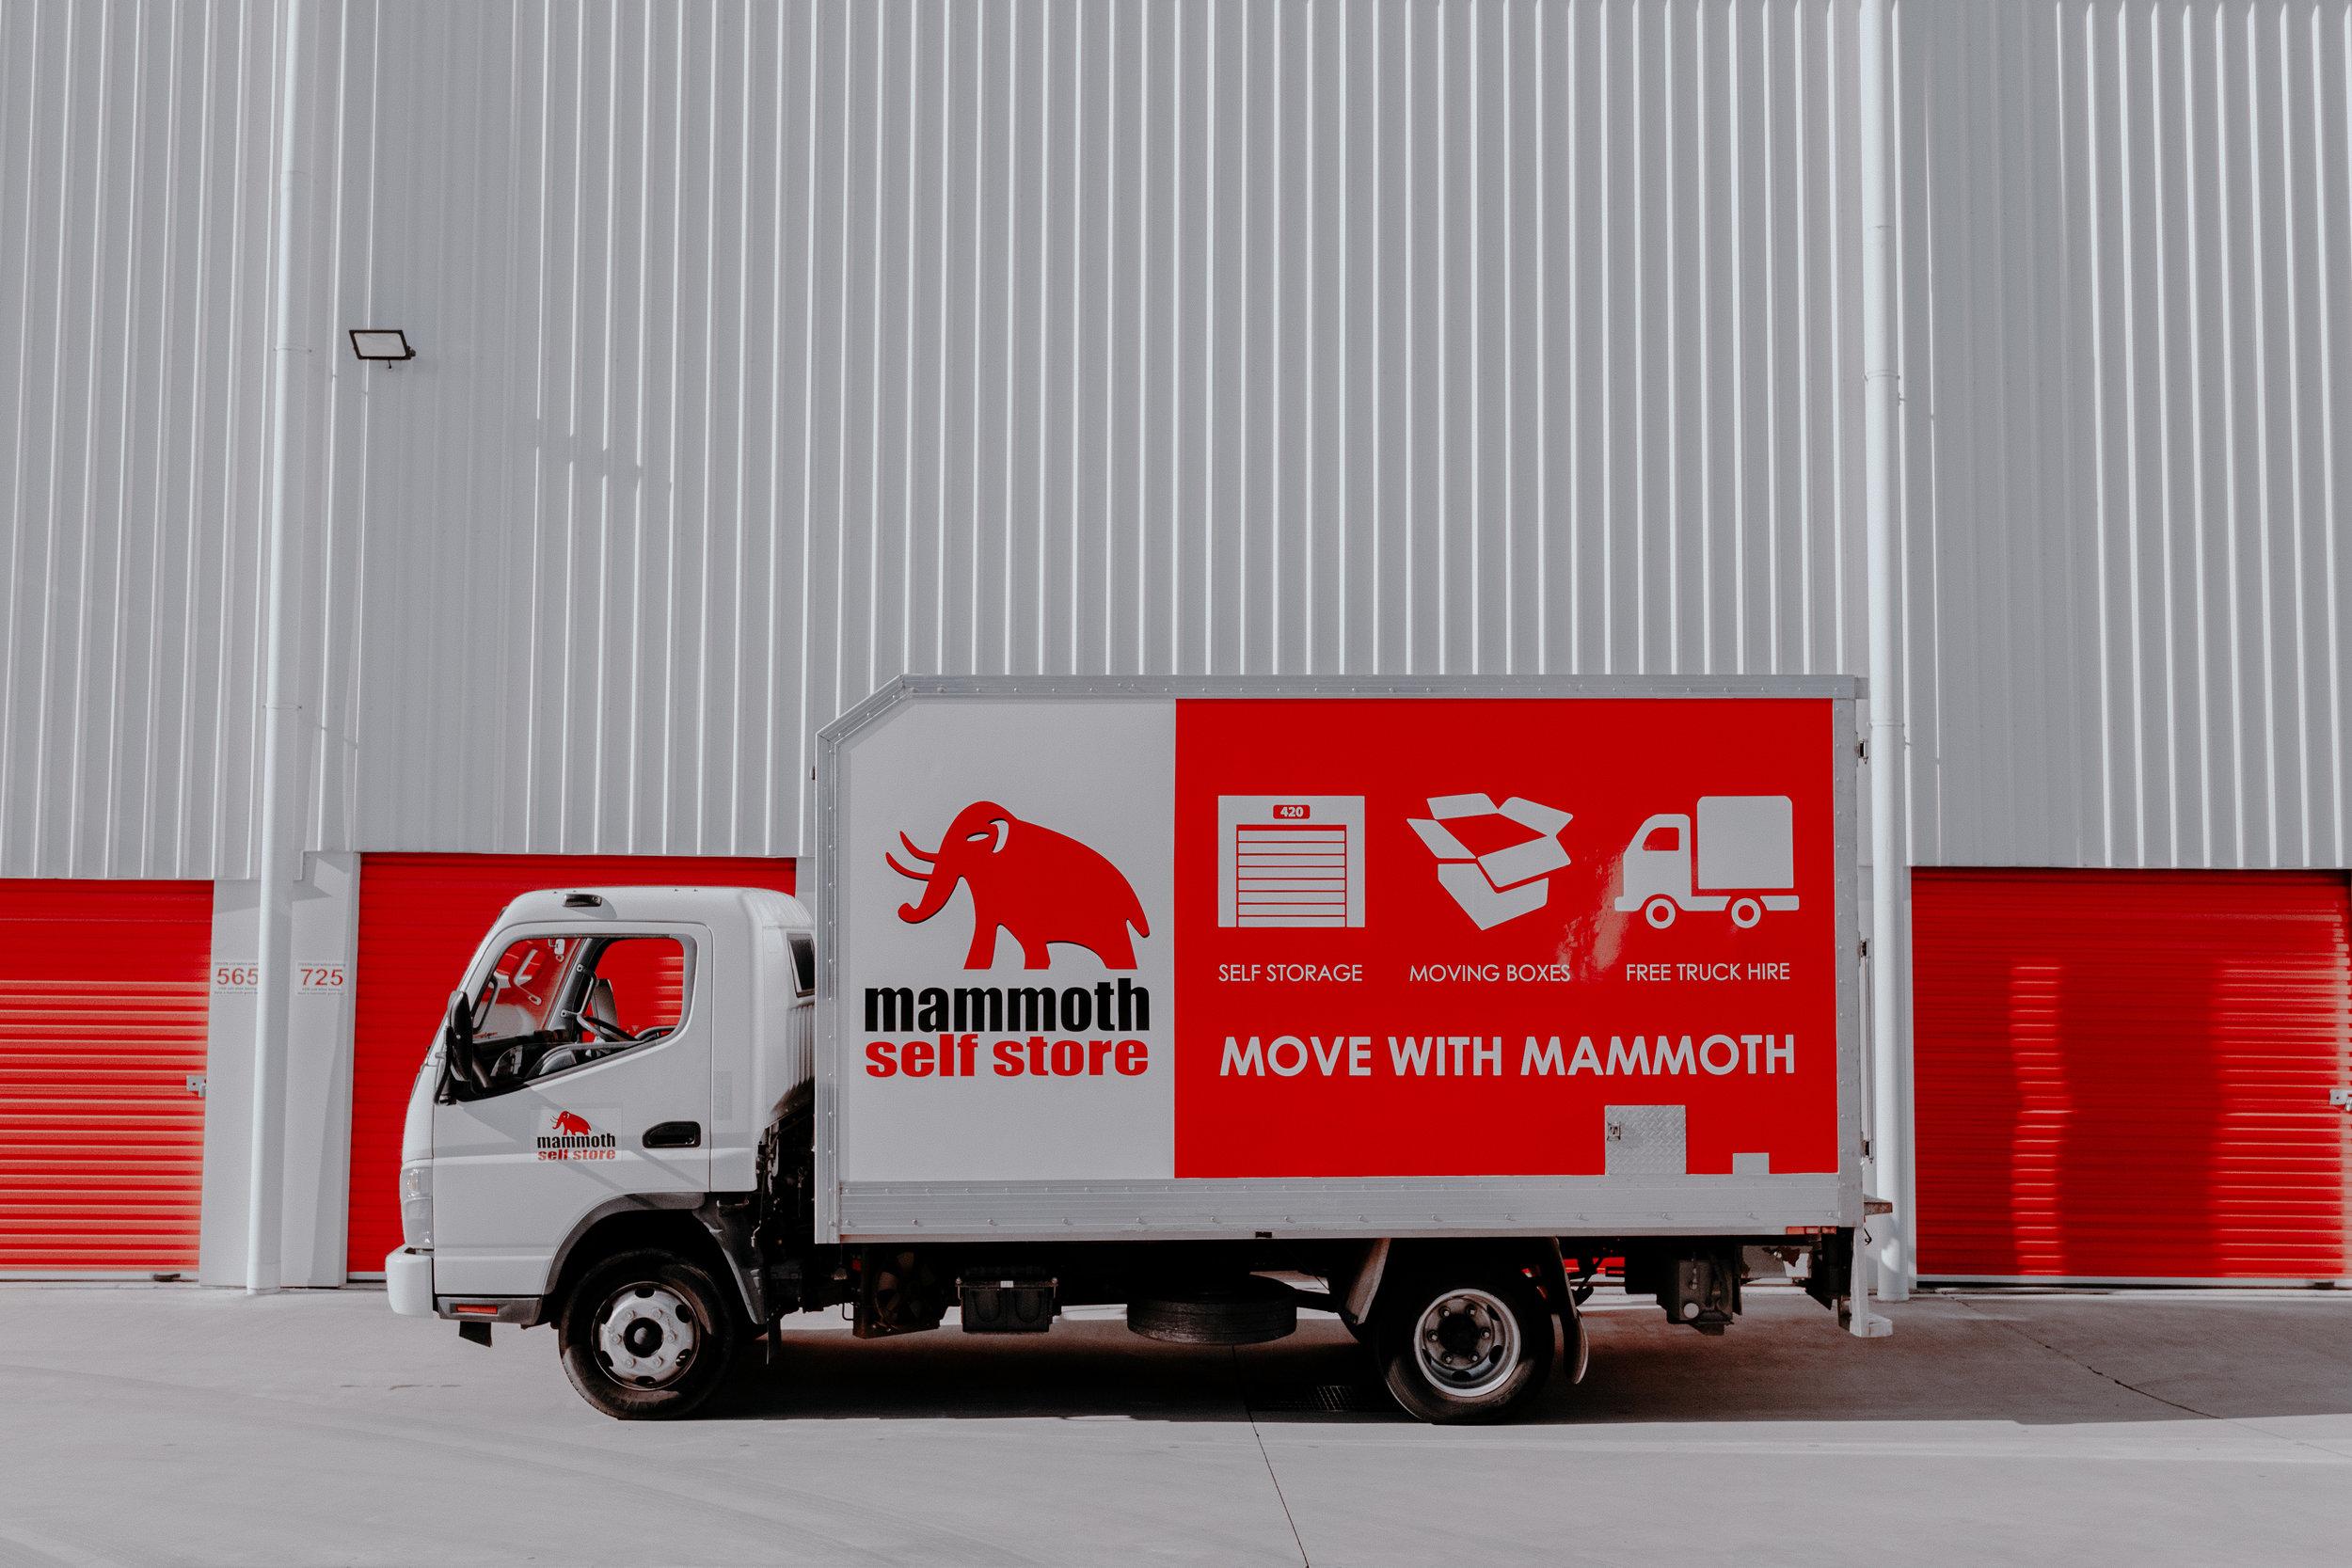 Free.Truck.Hire.At.Mammoth.Storage.jpg